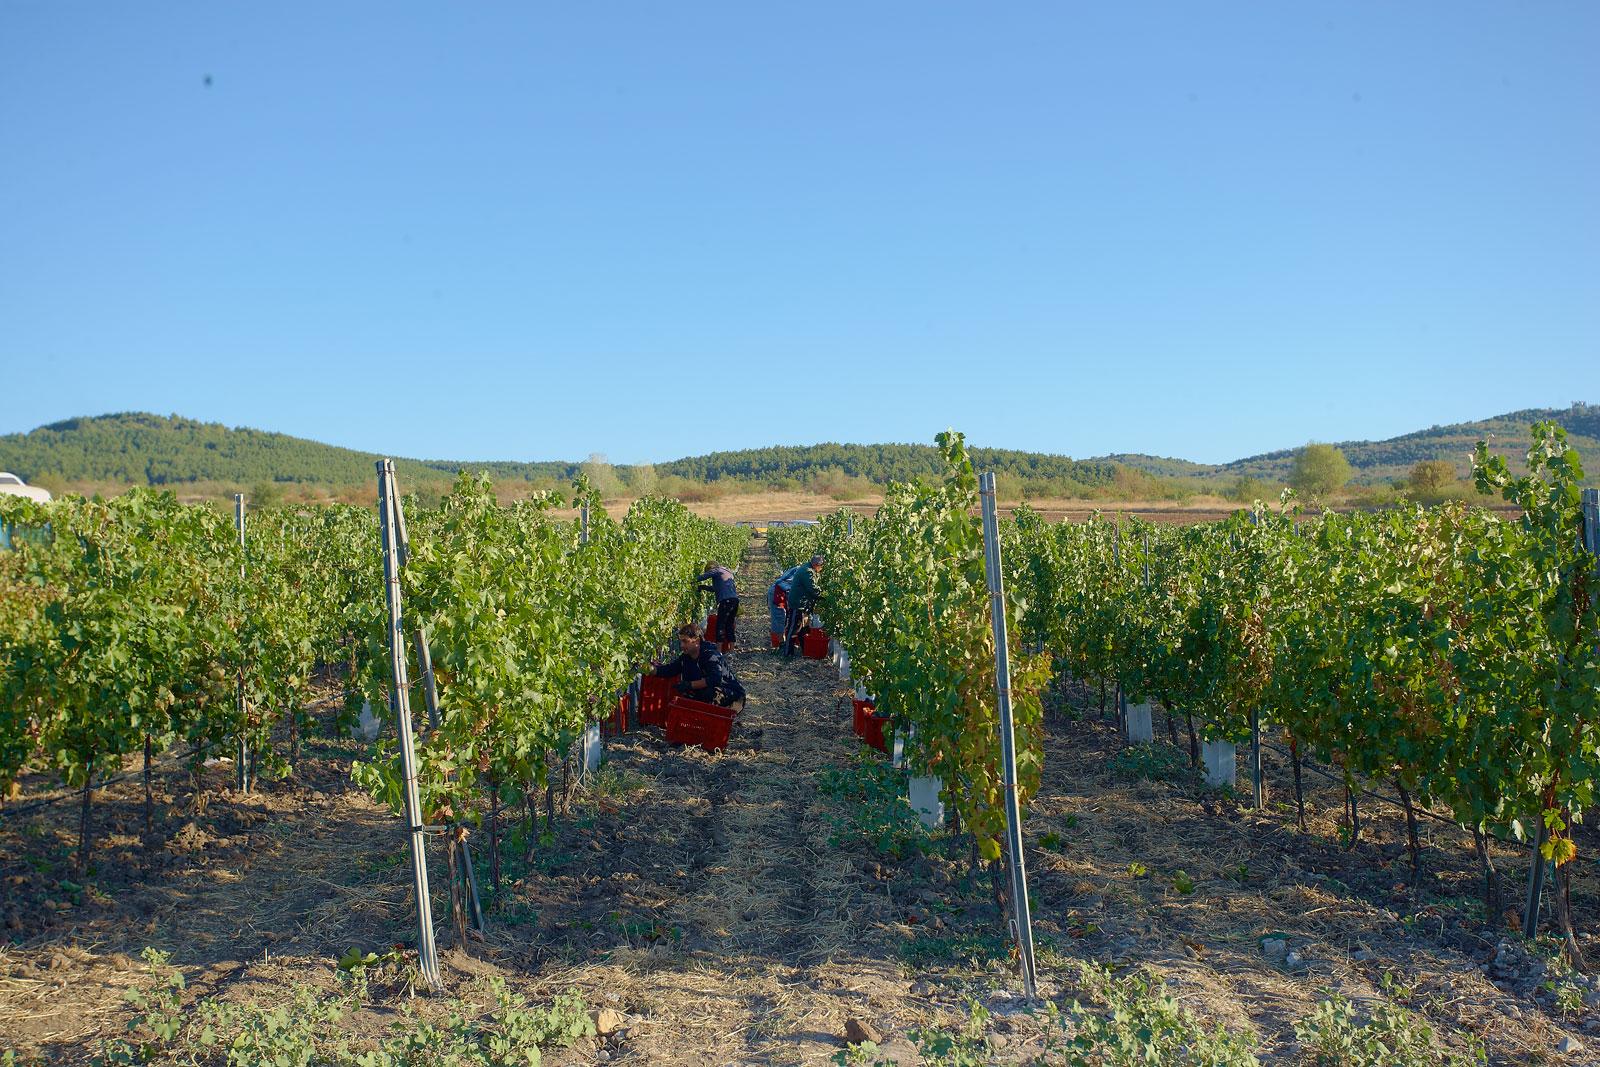 Take in the vineyards